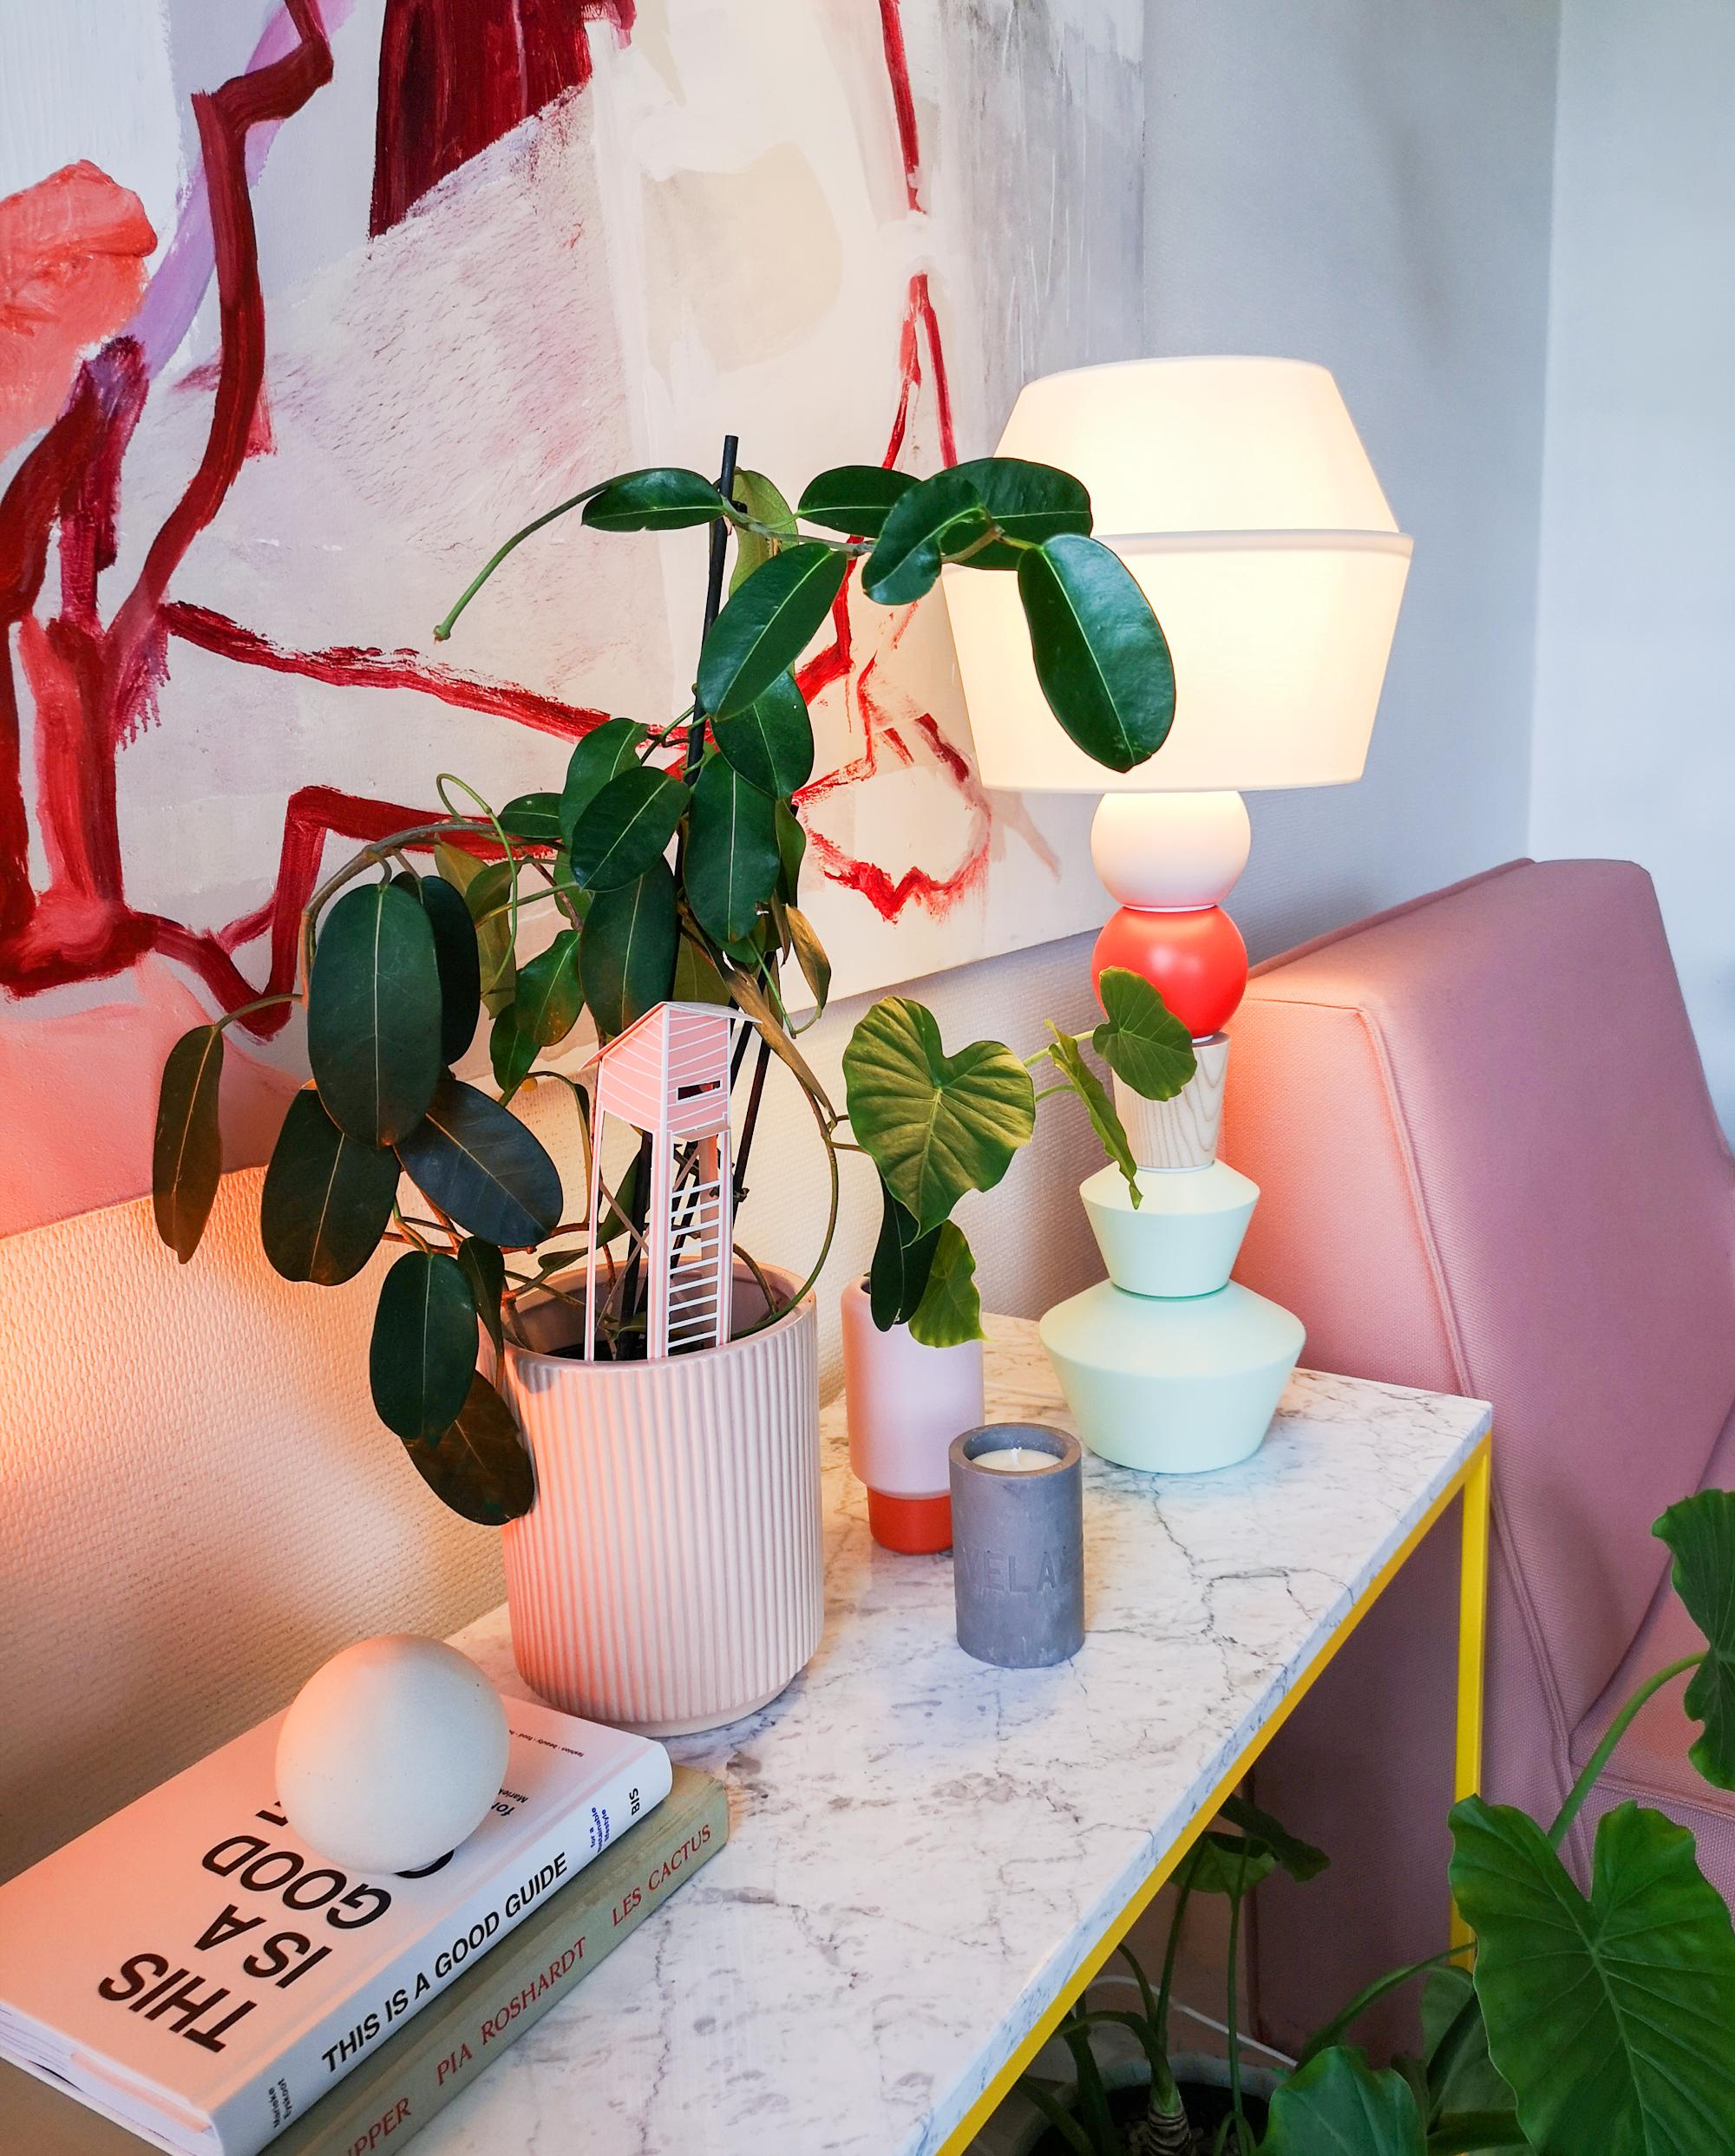 JOELIX.com - Cubit lamp totem